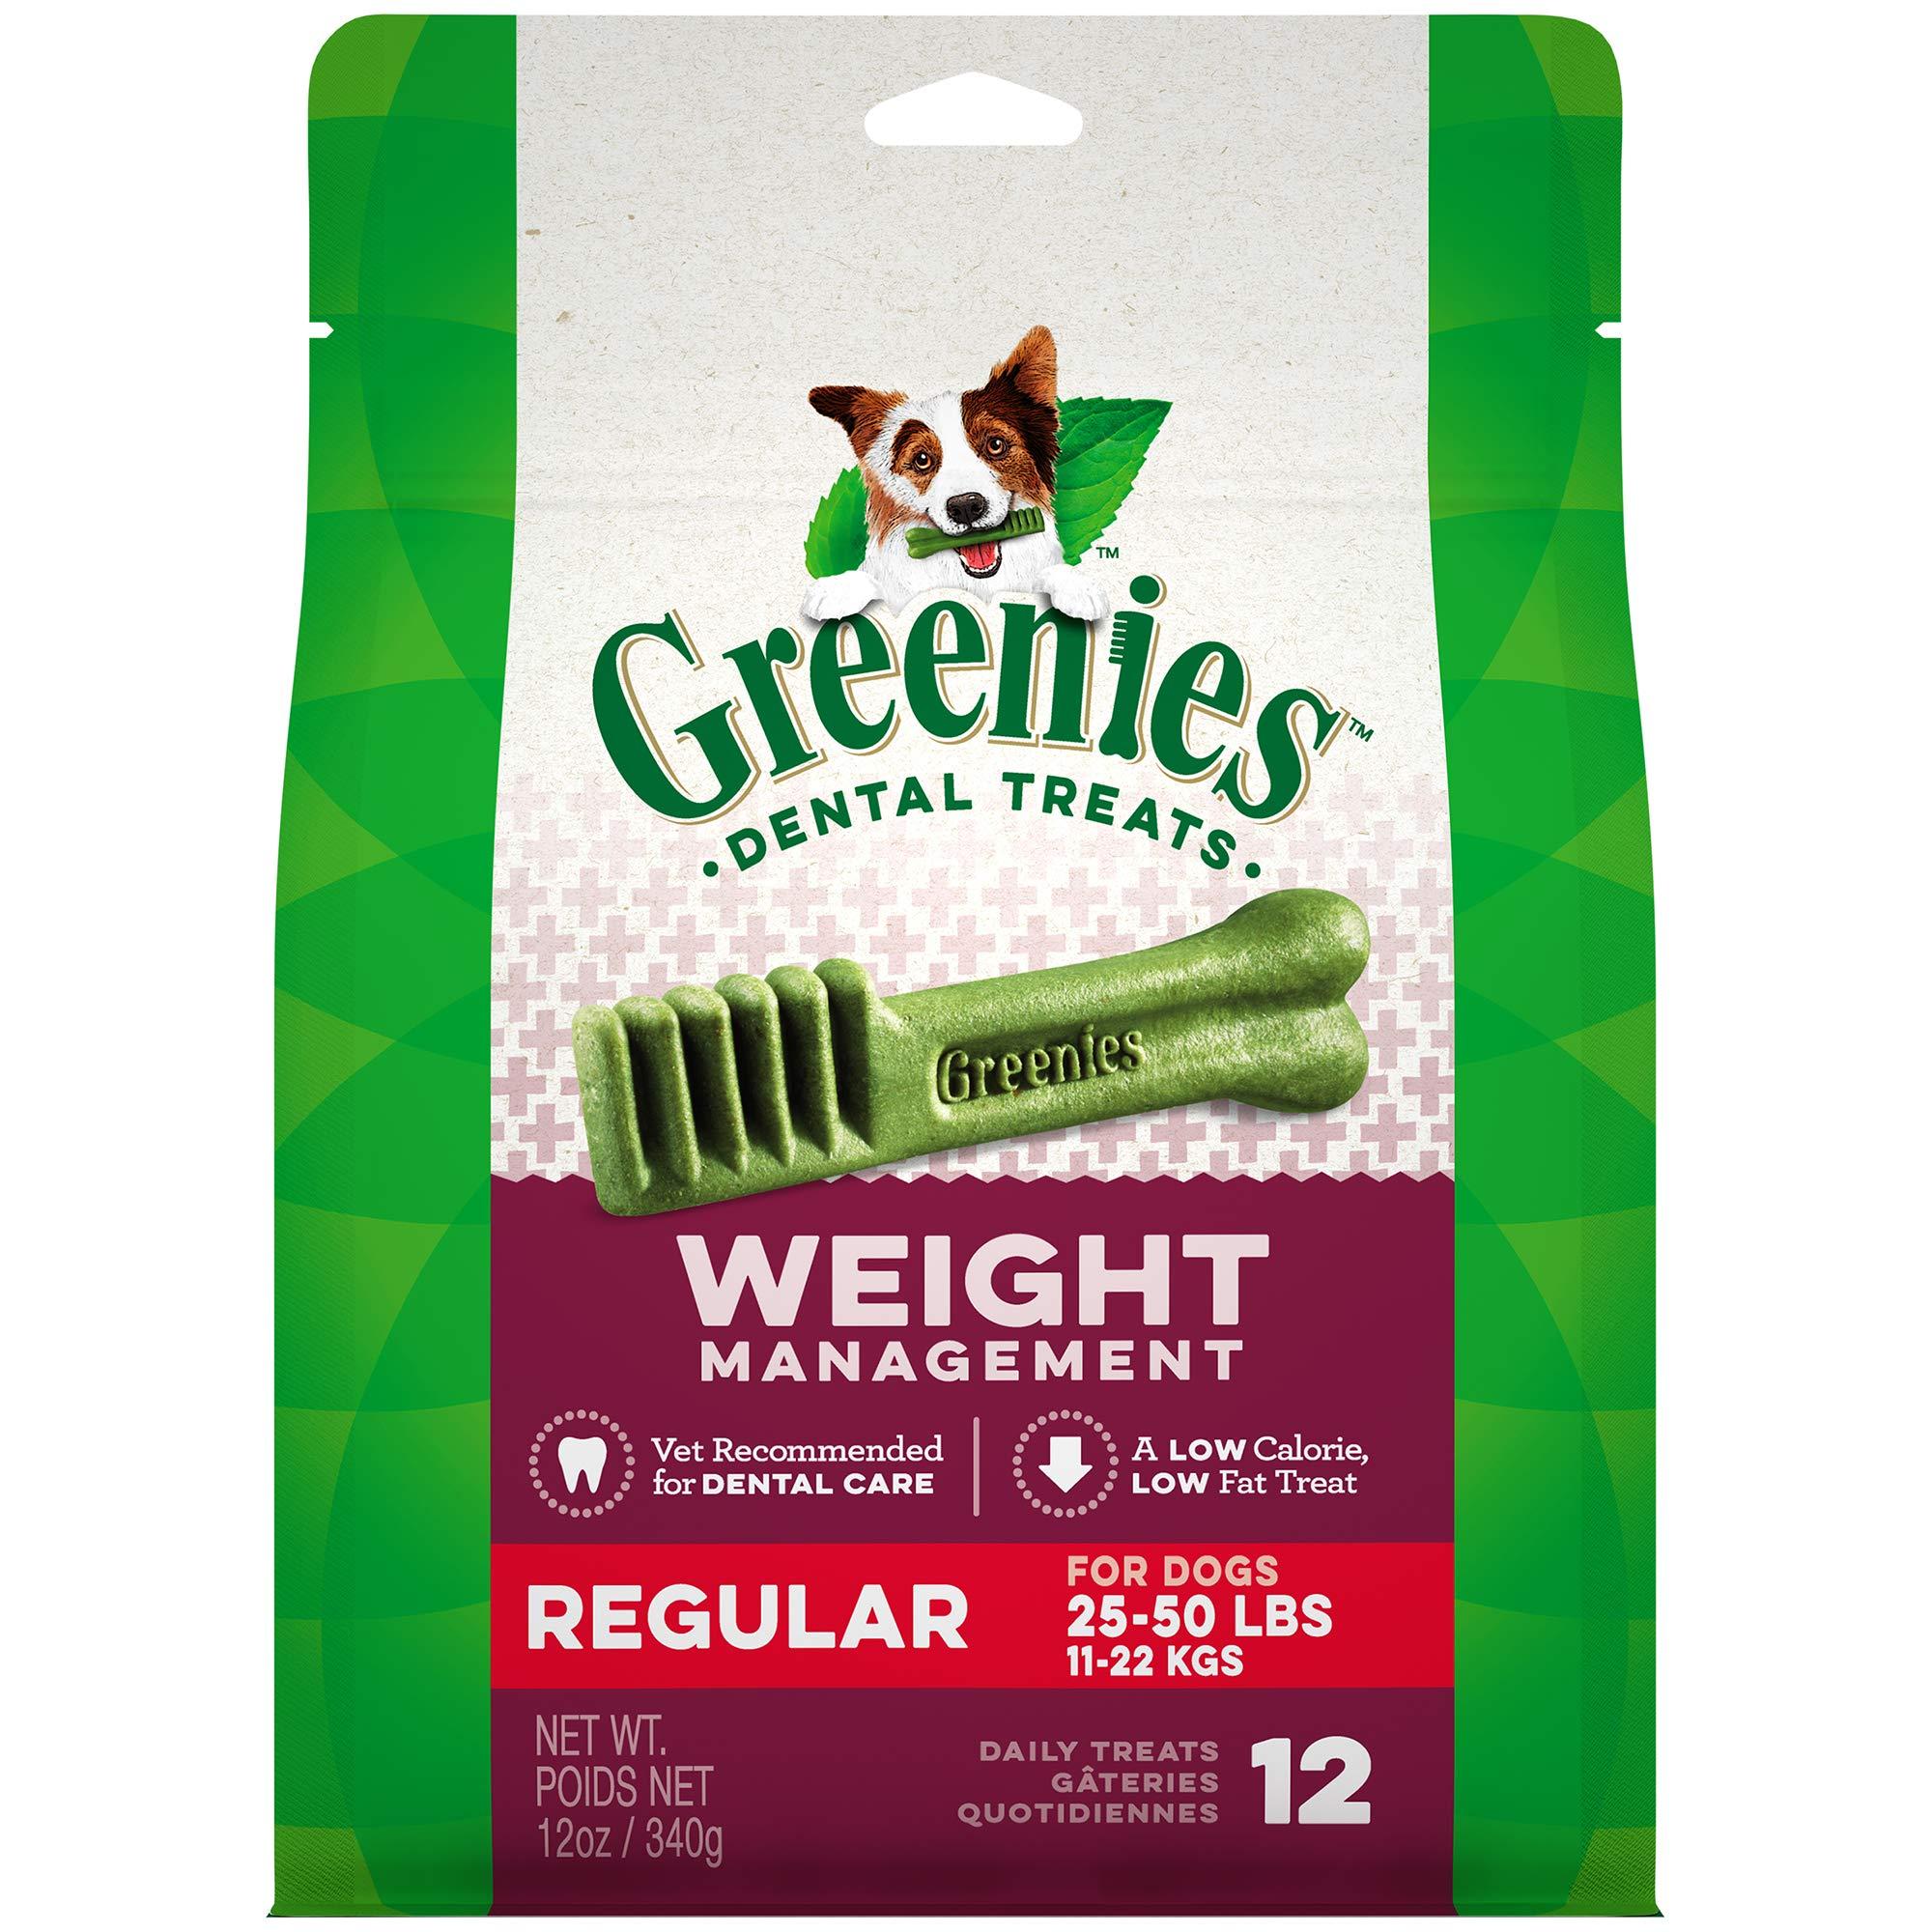 Greenies Weight Management Regular Size Dental Dog Chews - 12 Ounces 12 Treats by Greenies (Image #12)